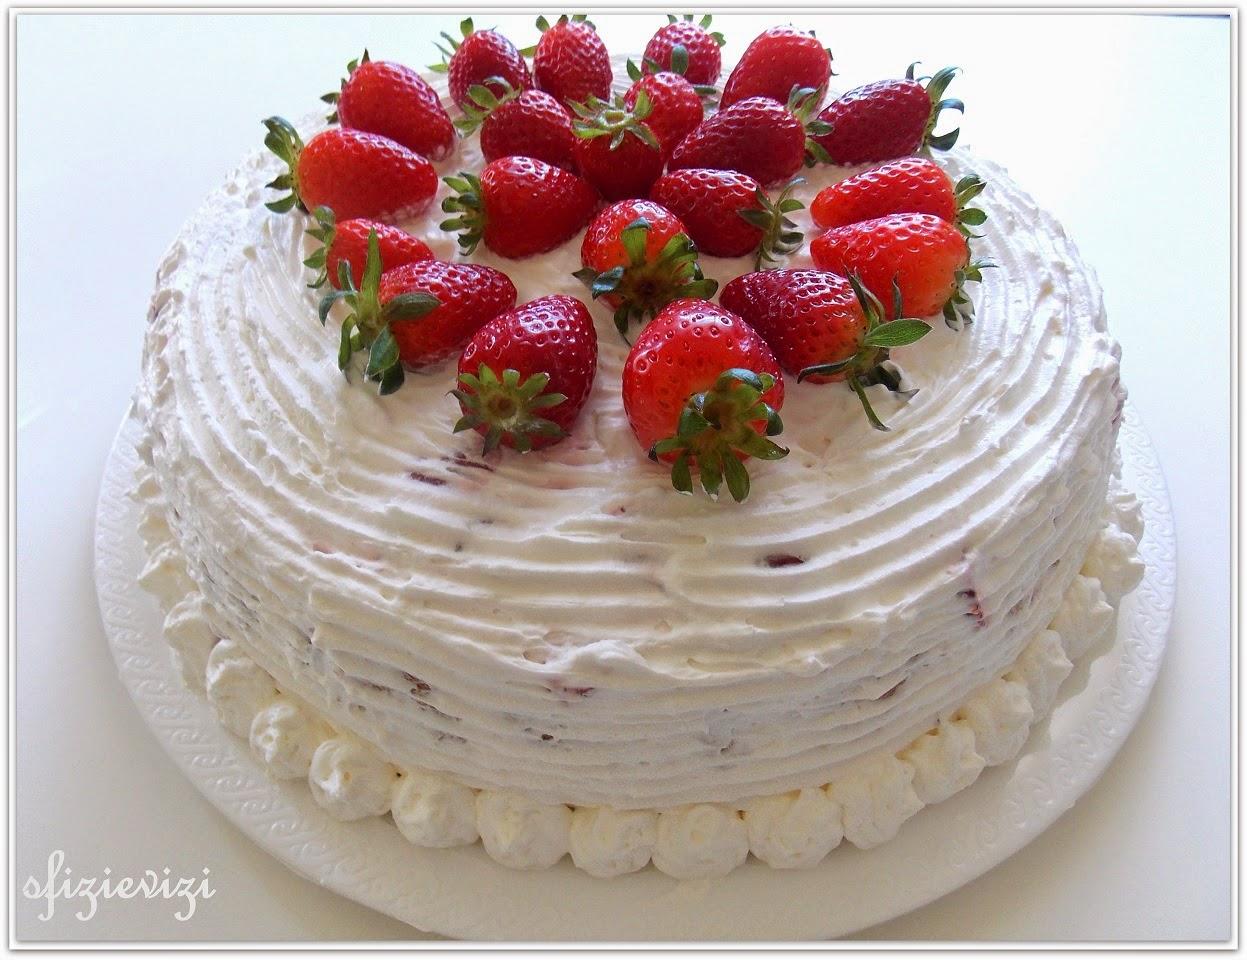 Ricette bimby torta di fragole e panna